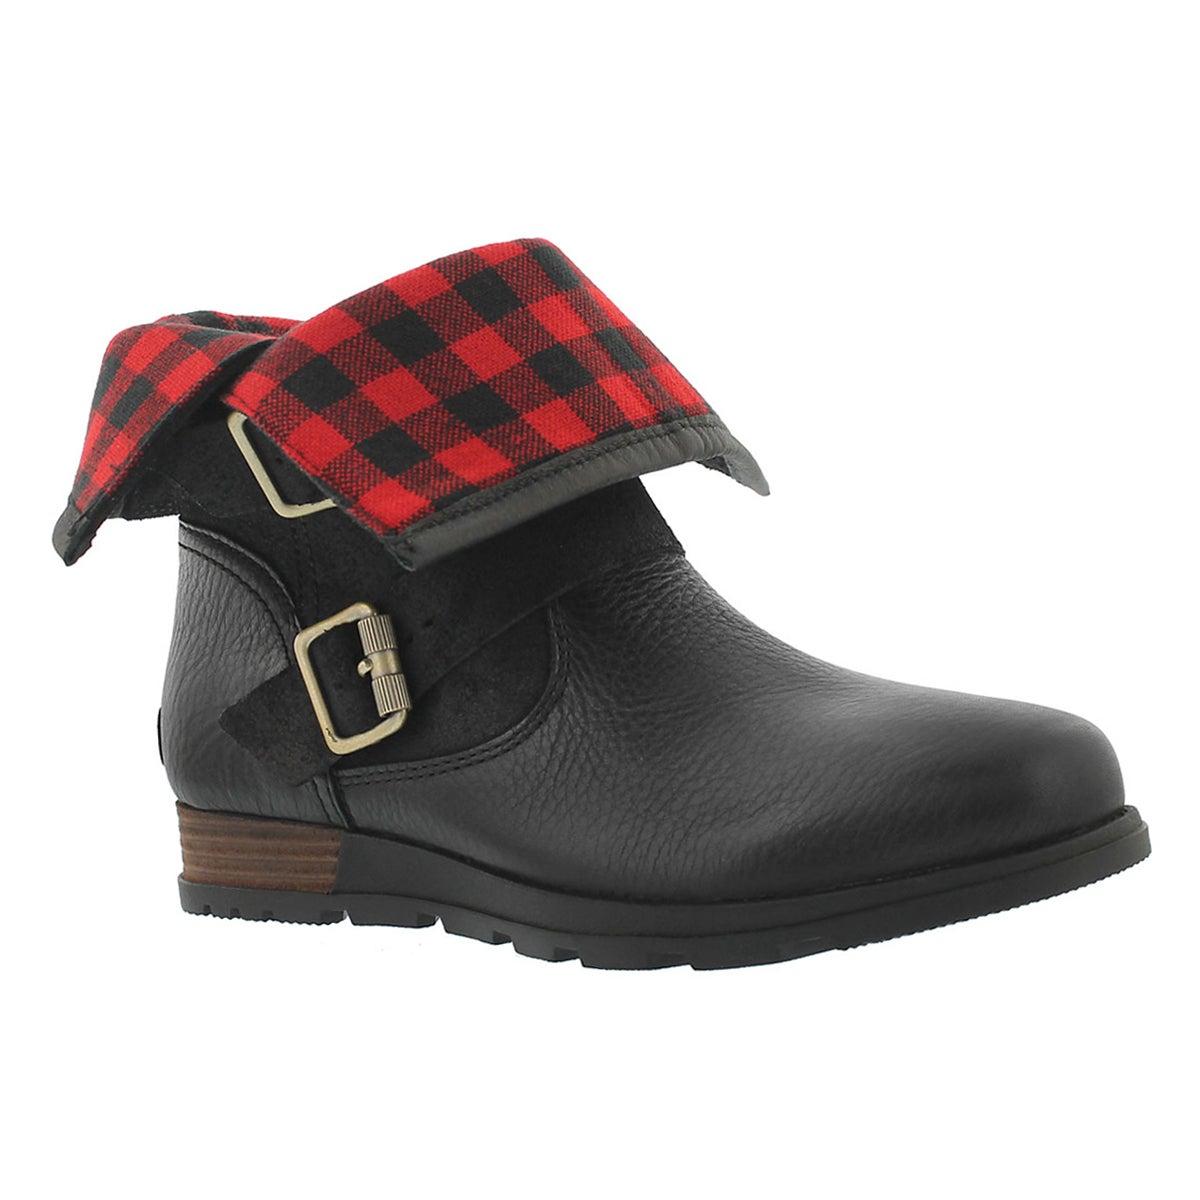 Women's MAJOR MOTO black fold down ankle boots